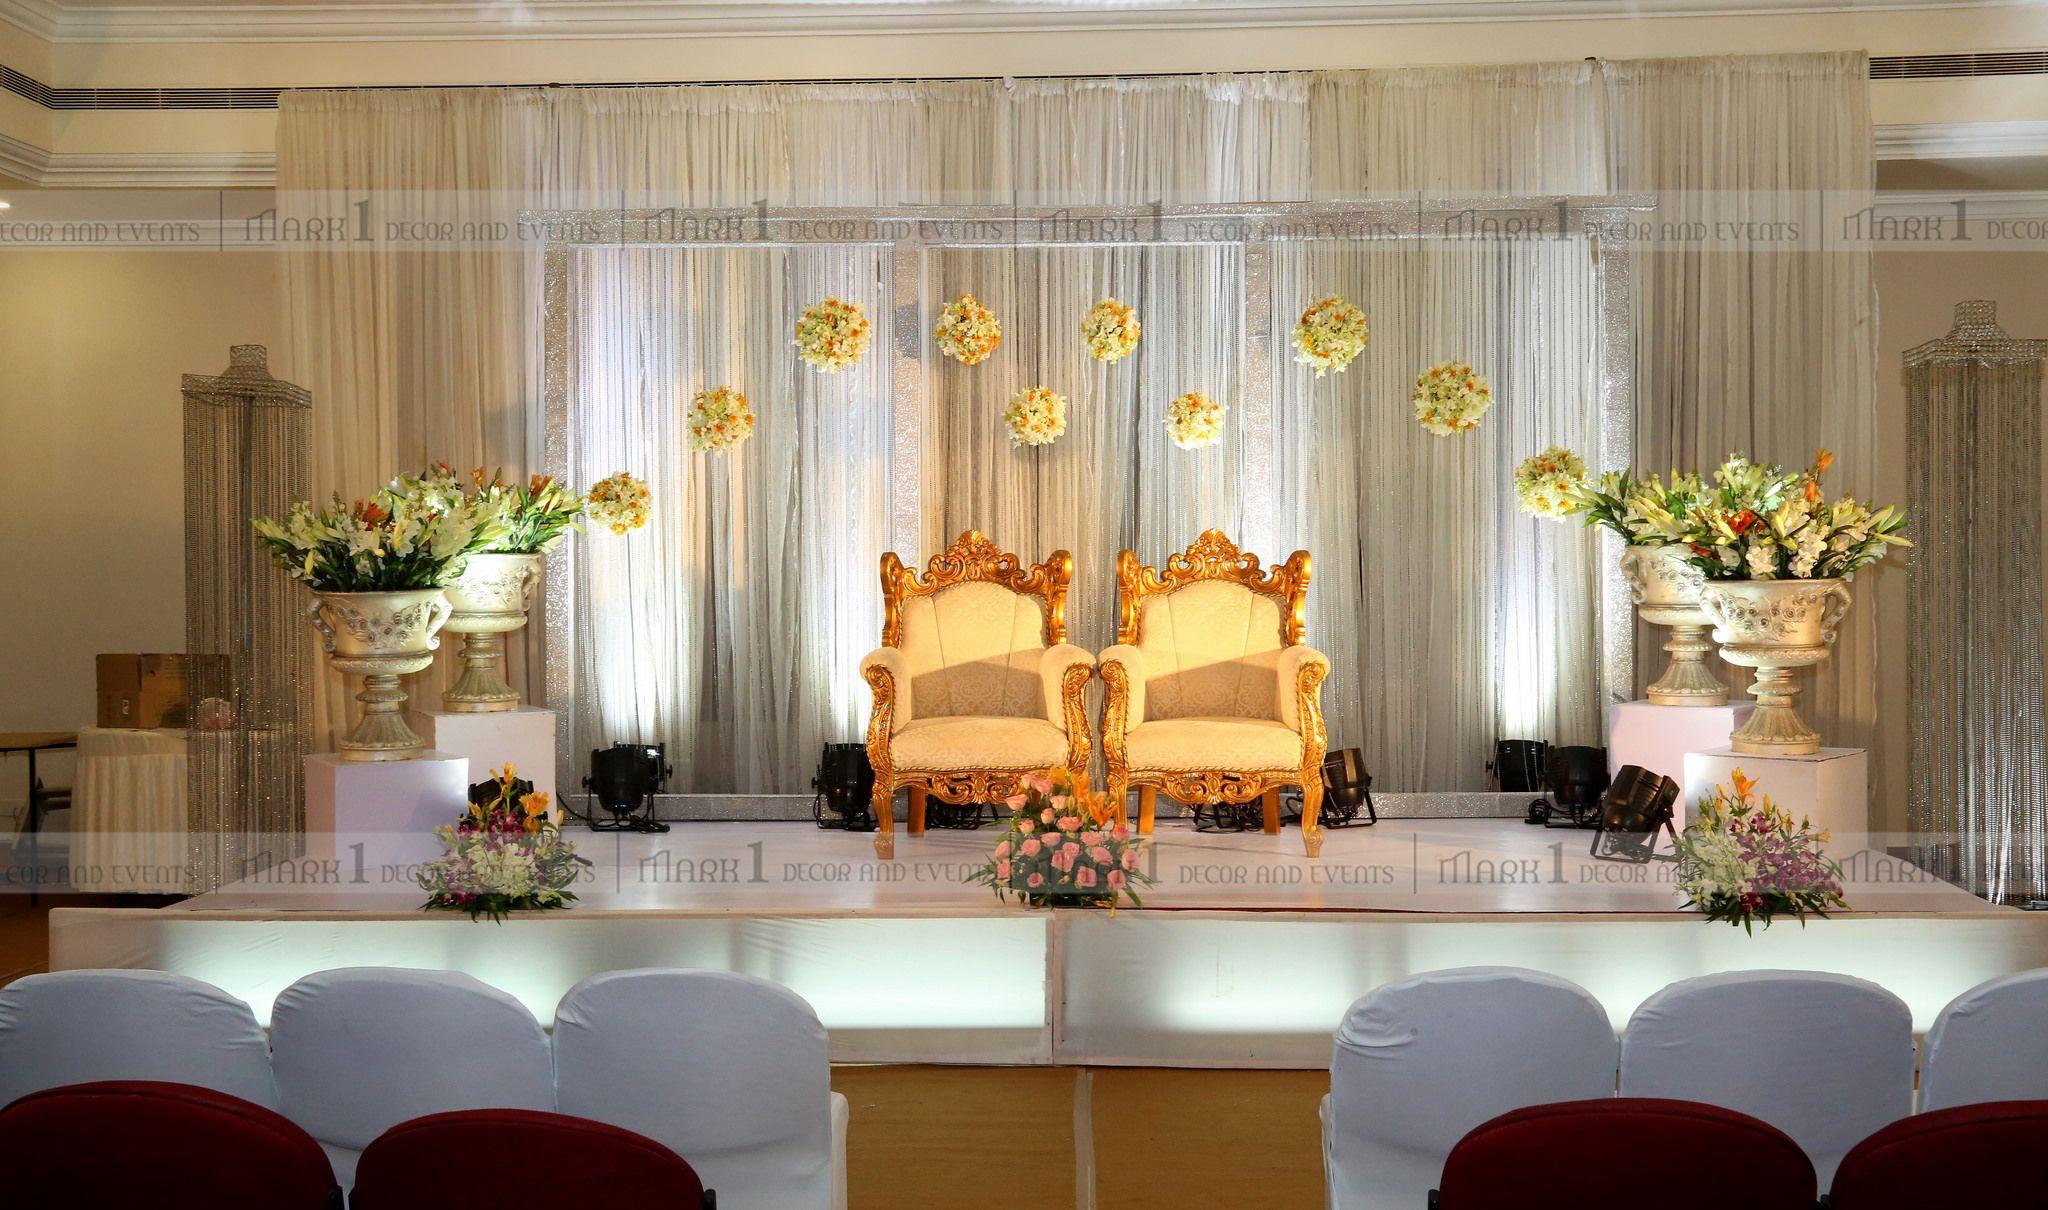 Mark1 decors wedding stage decorators in coimbatore chennai decors wedding stage decorators in coimbatore chennai bangalore cochin junglespirit Gallery